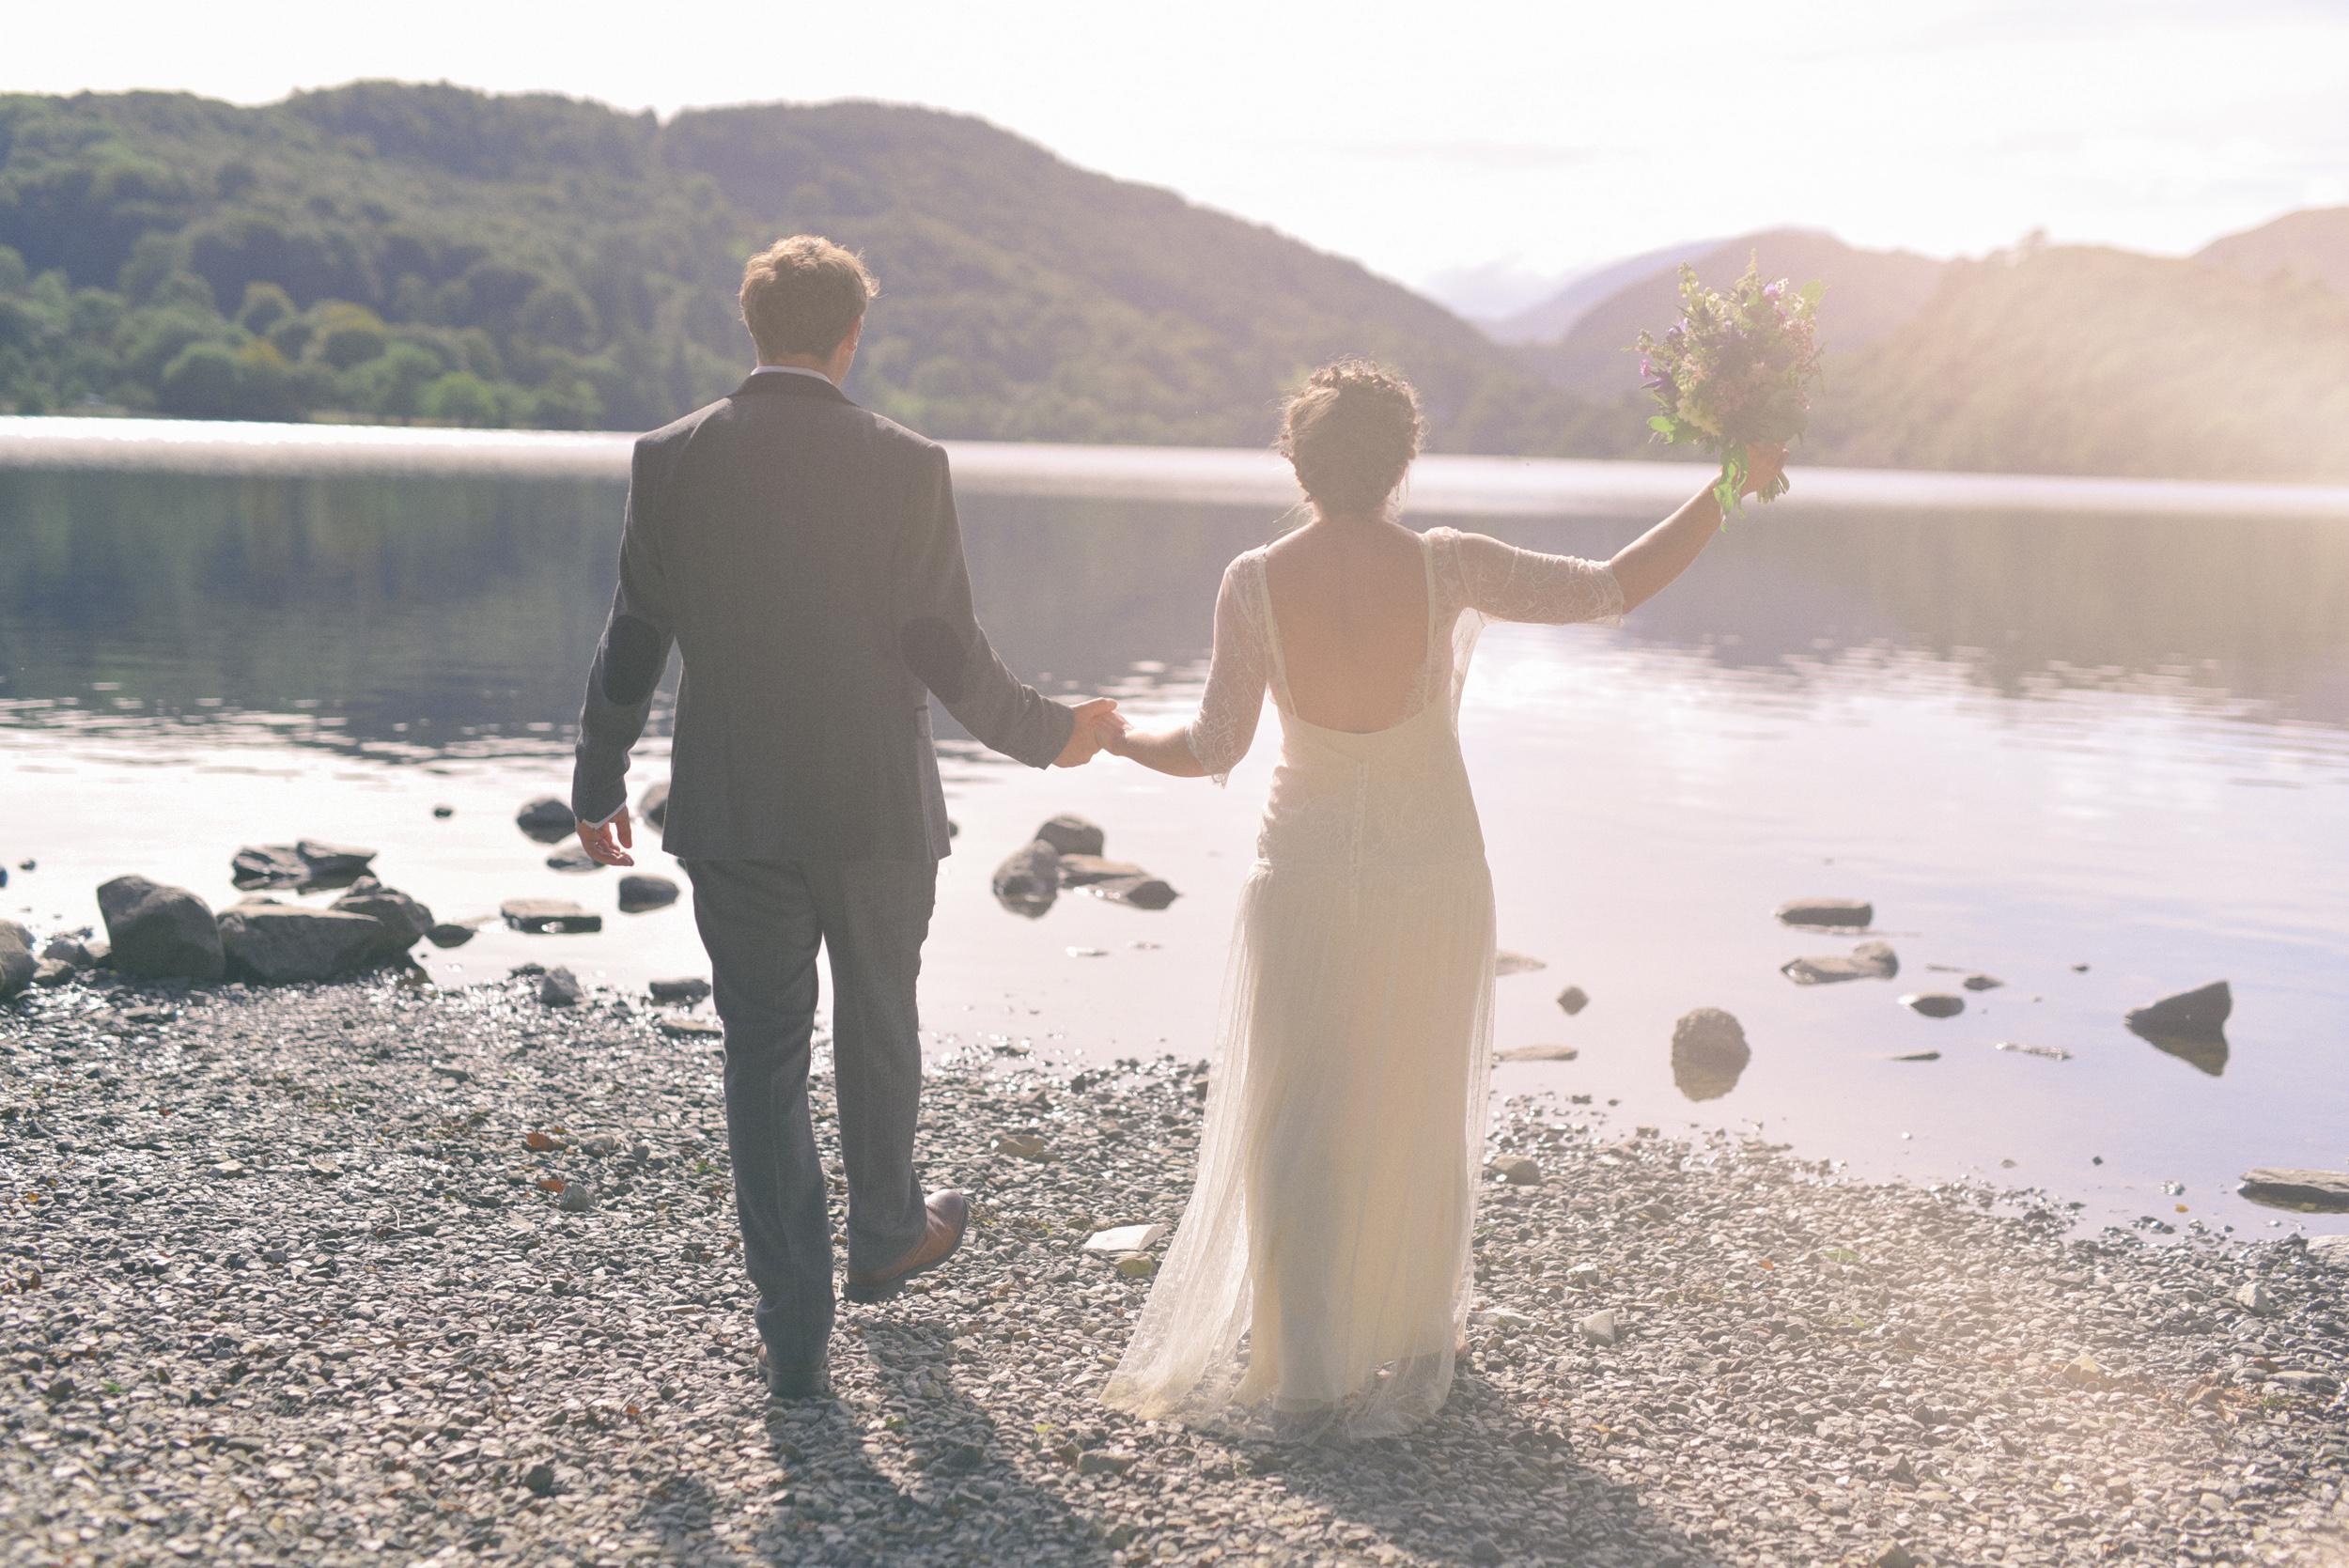 Miriam-Bespoke-Lace-Wedding-Dress-Kate-Beaumont-Sheffield-9.jpg